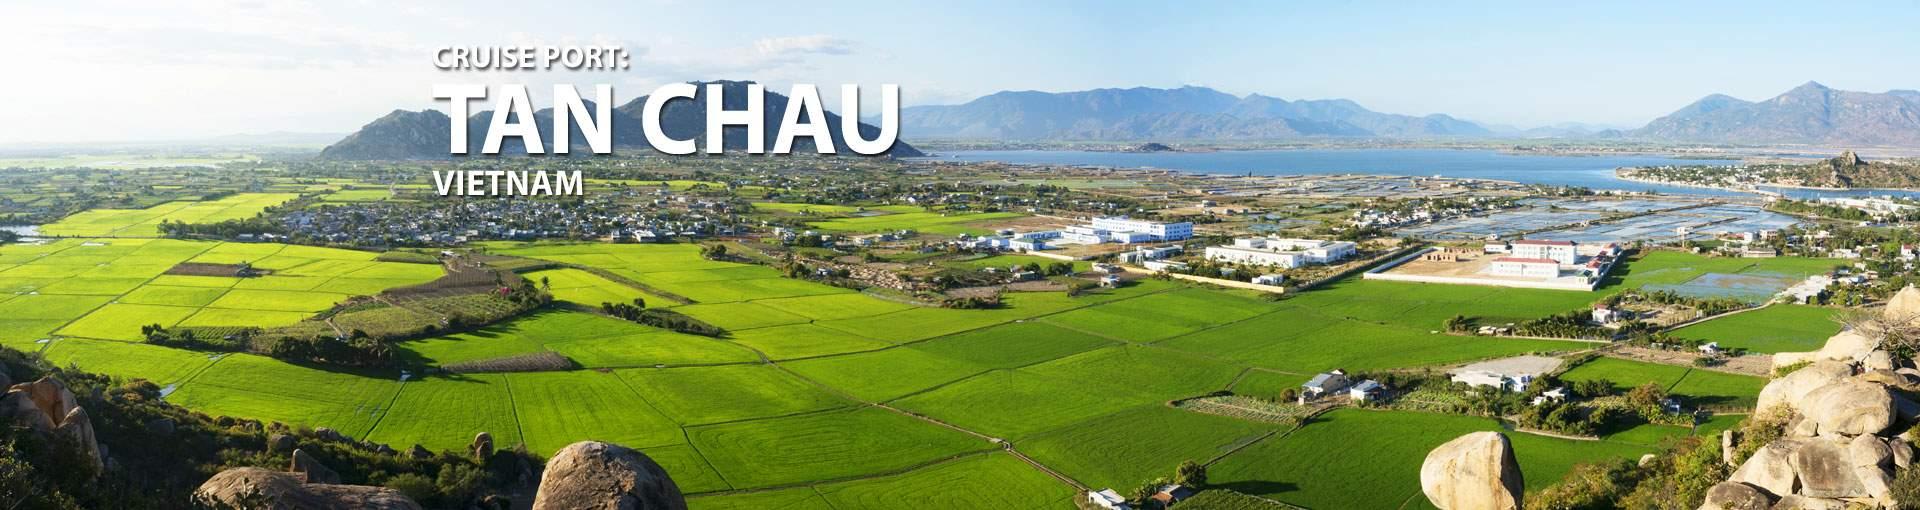 Cruises to Tan Chau, Vietnam